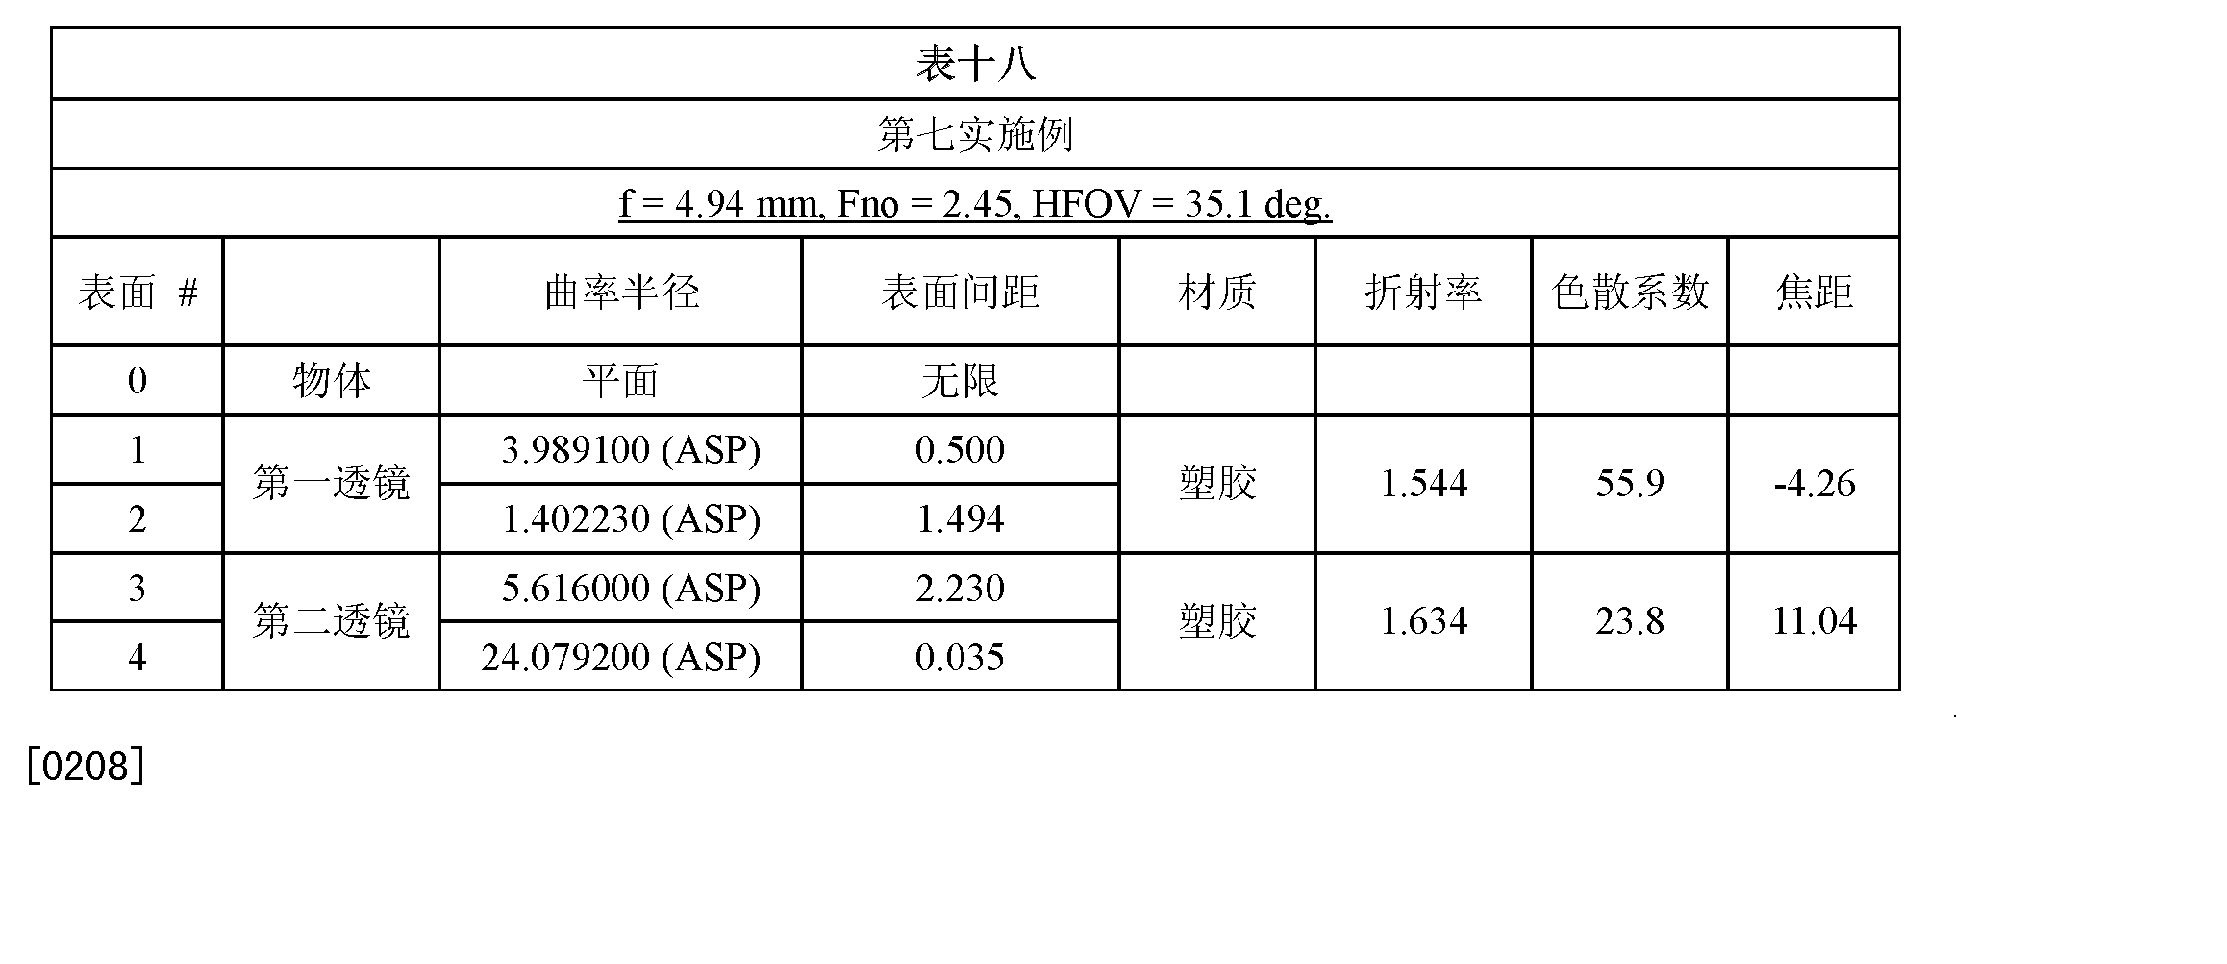 Figure CN202166776UD00221